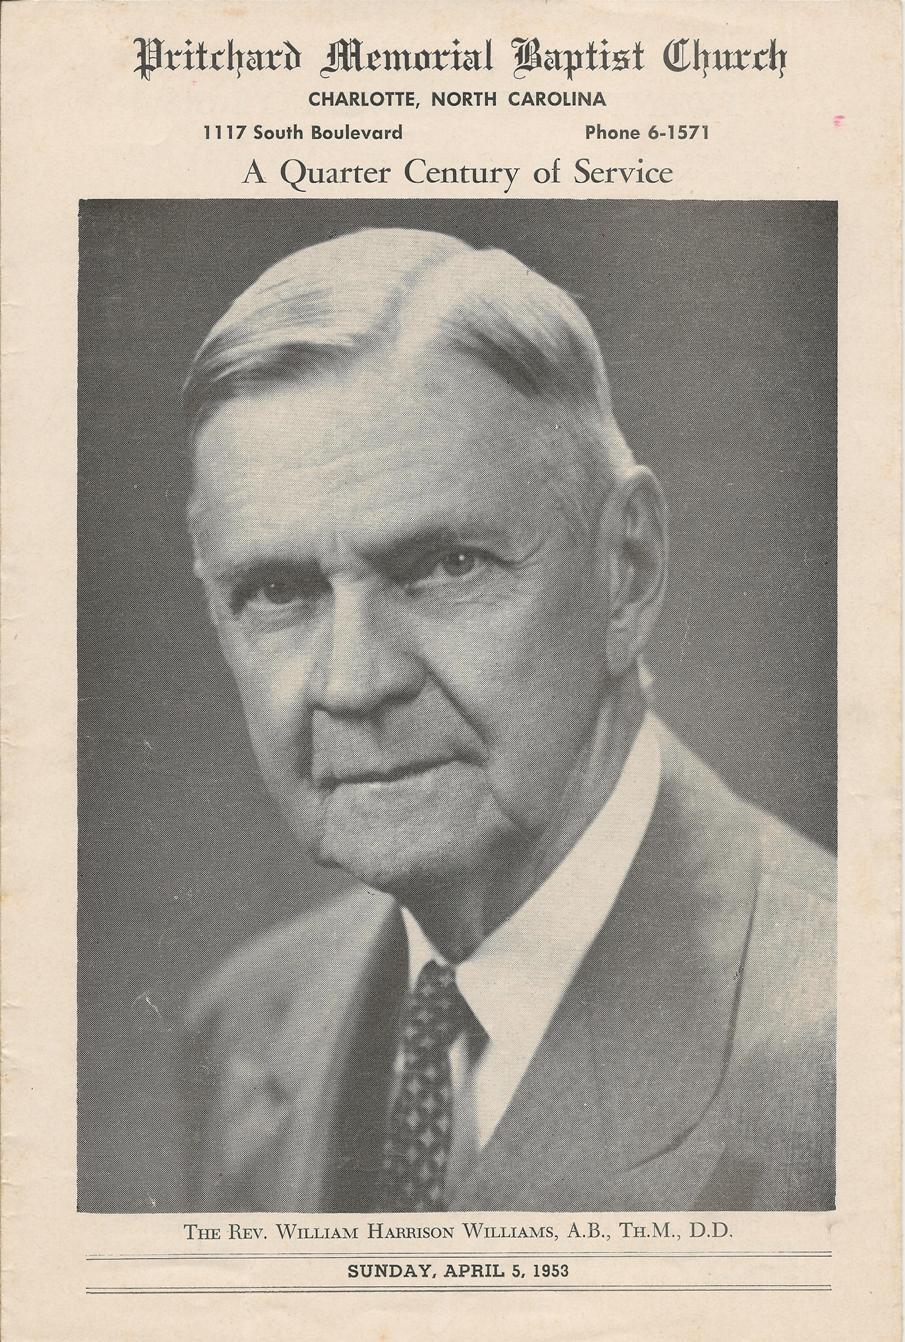 PMBC+Dr.+William+H.+Williams+1953+25th+Anniversary+Bulletin.jpg